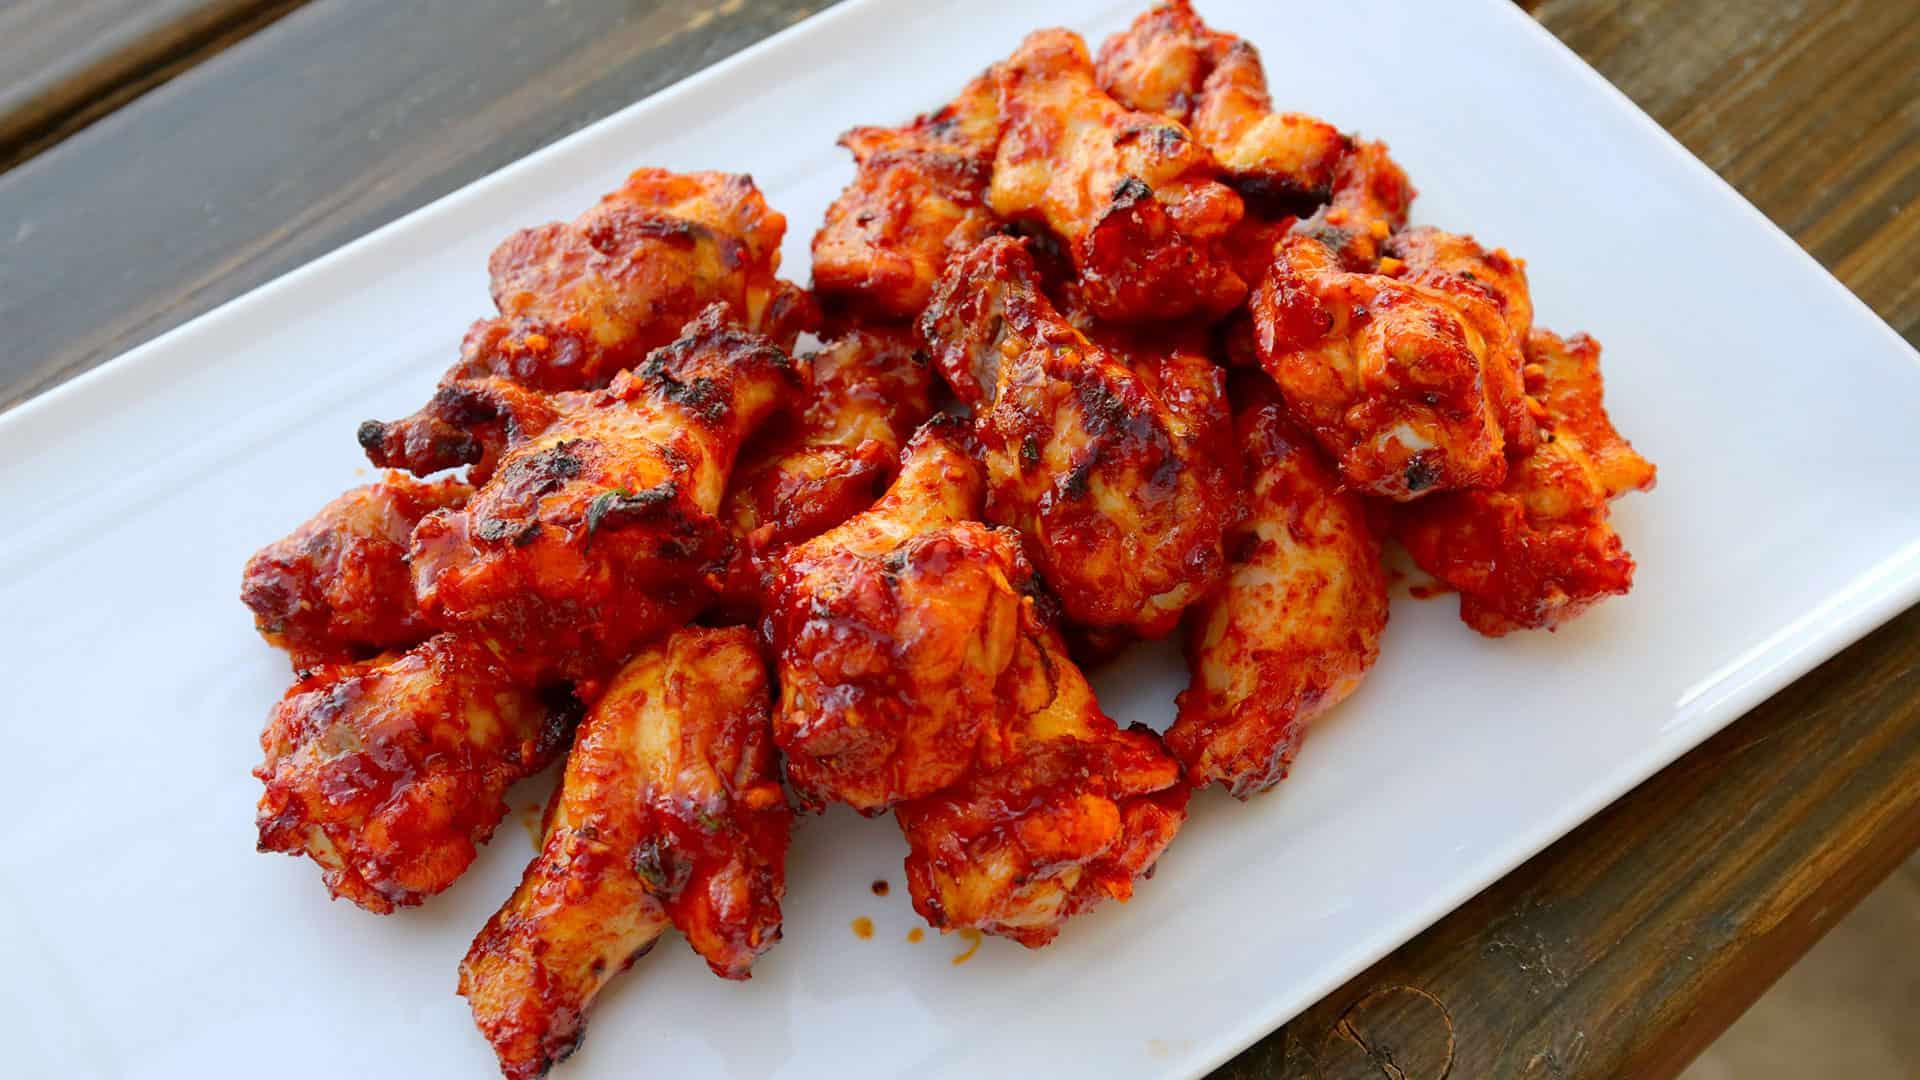 Spicy BBQ chicken drumettes (Maeun-dakbonggui) recipe - Maangchi.com